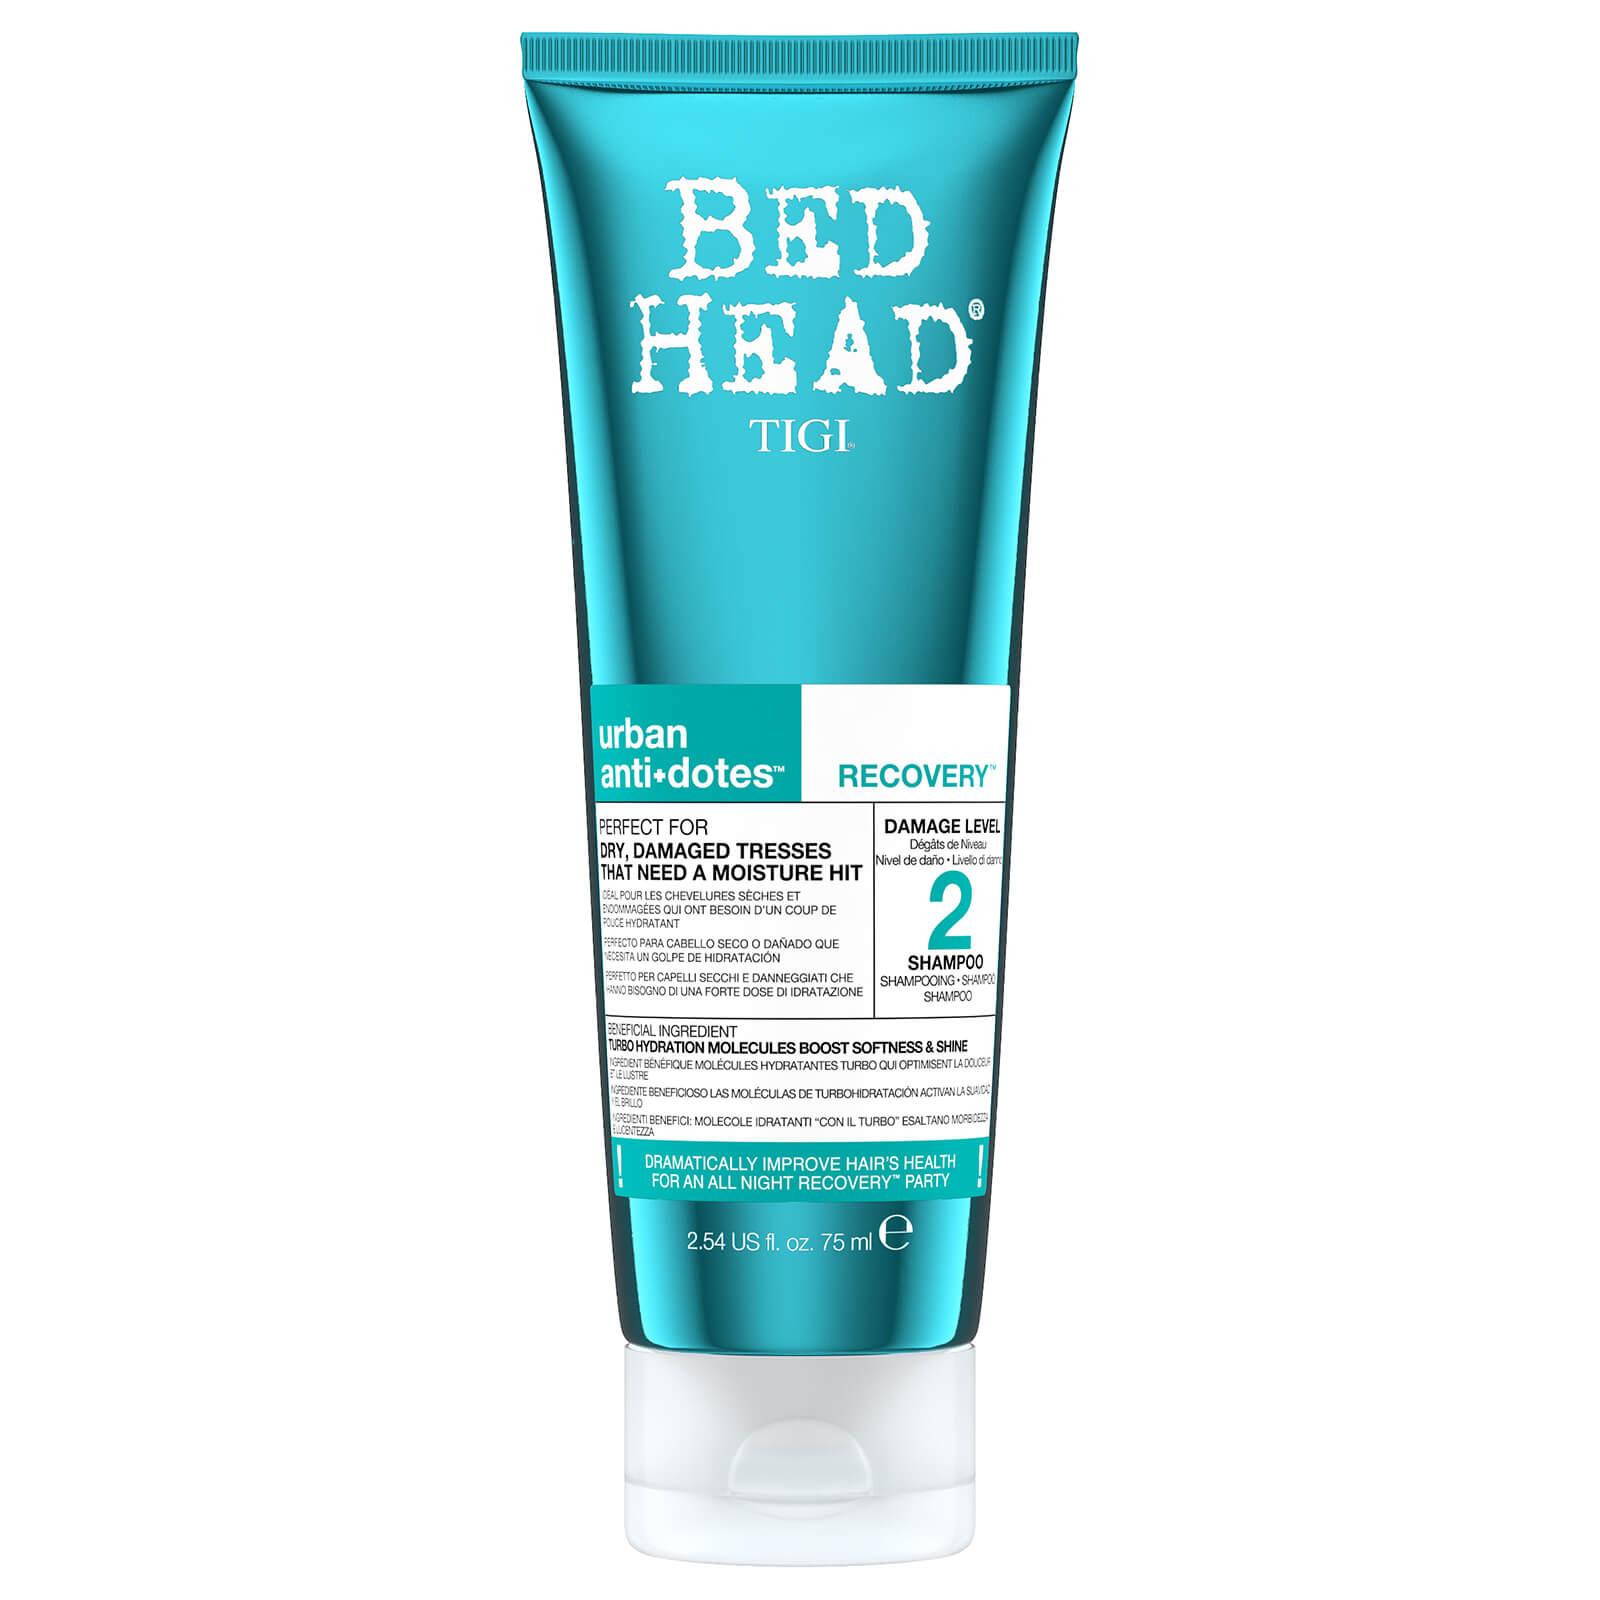 Tigi Bed Head Travel Size Urban Antidotes Recovery Moisture Shampoo 75ml Free Shipping Lookfantastic